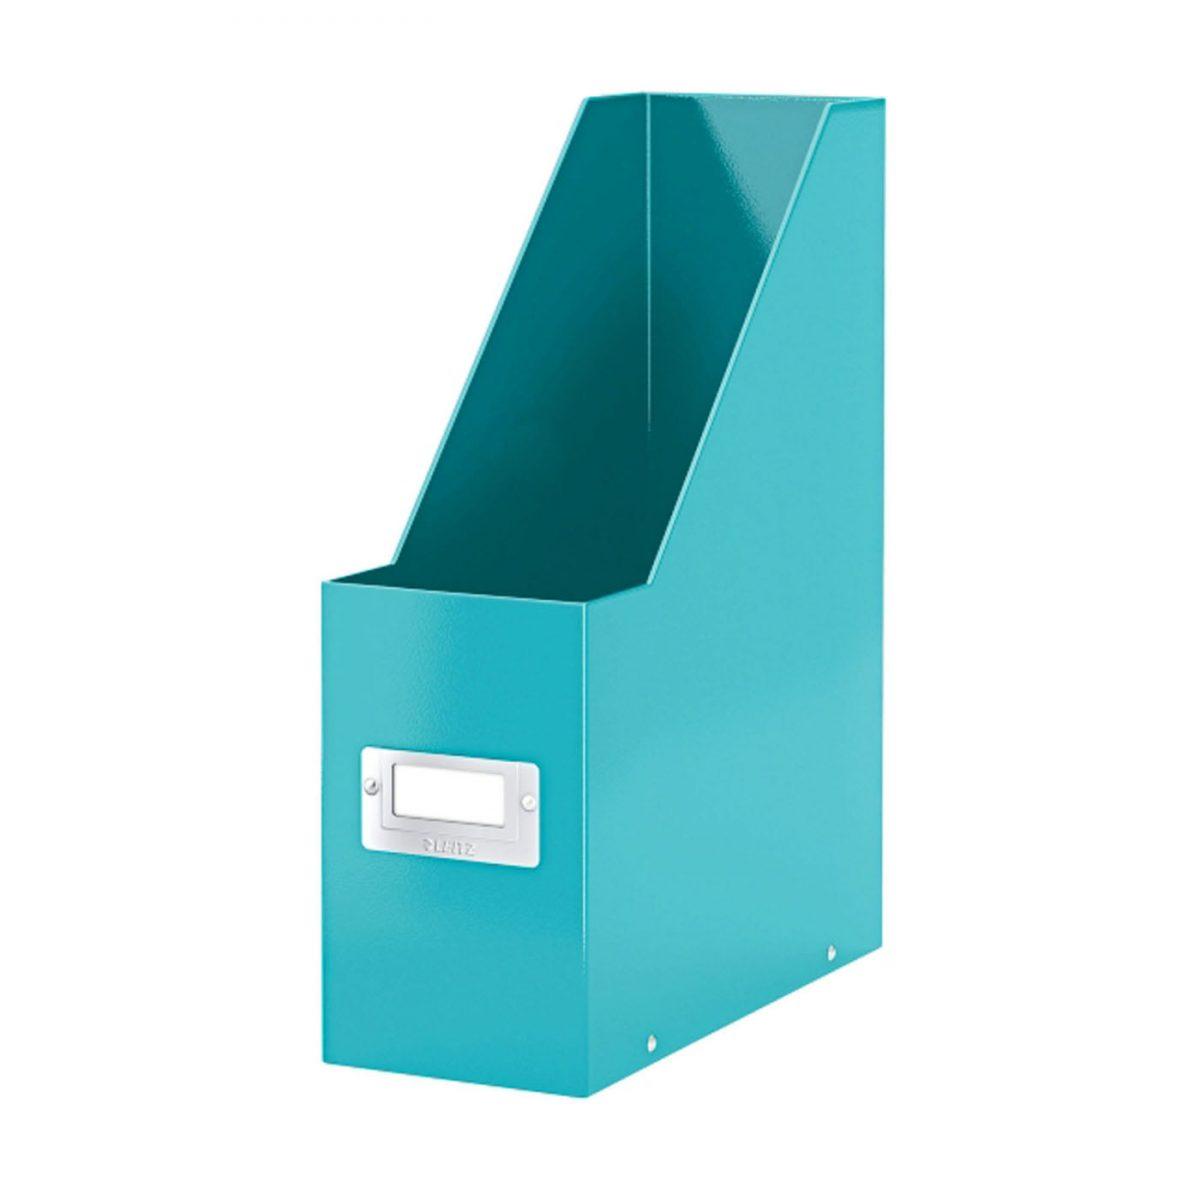 Suport vertical LEITZ Click & Store pentru documente, carton laminat - turcoaz